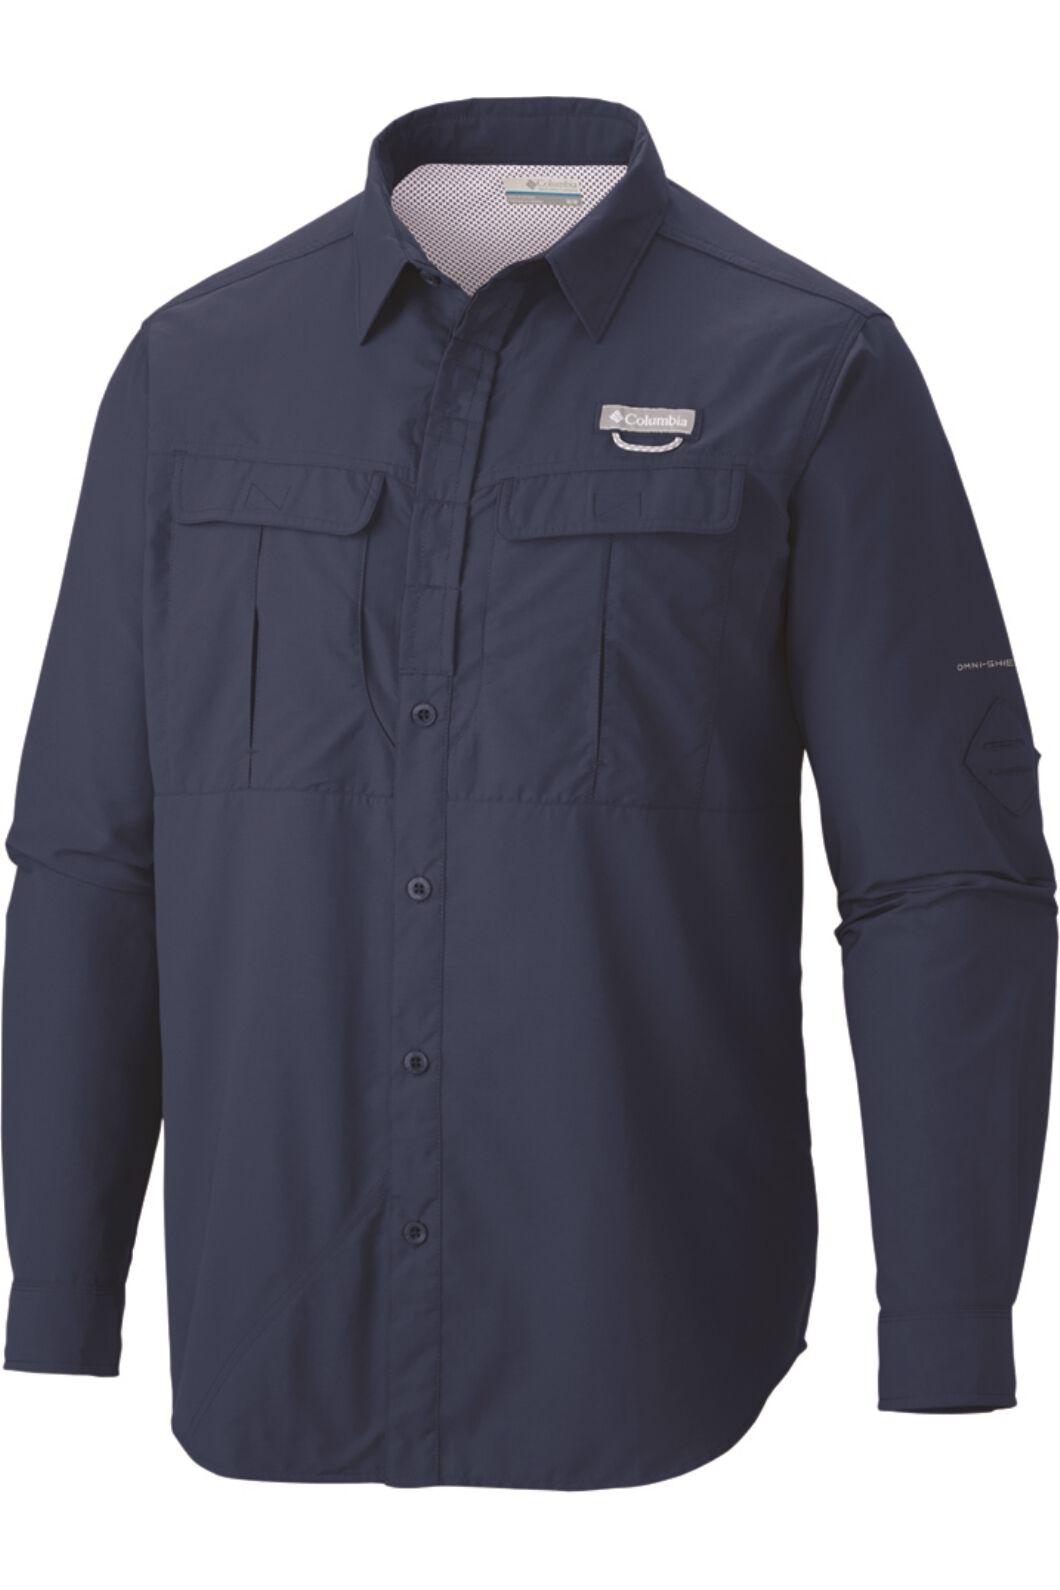 Columbia Men's Cascade Explorer Long Sleeve Shirt, Carbon, hi-res